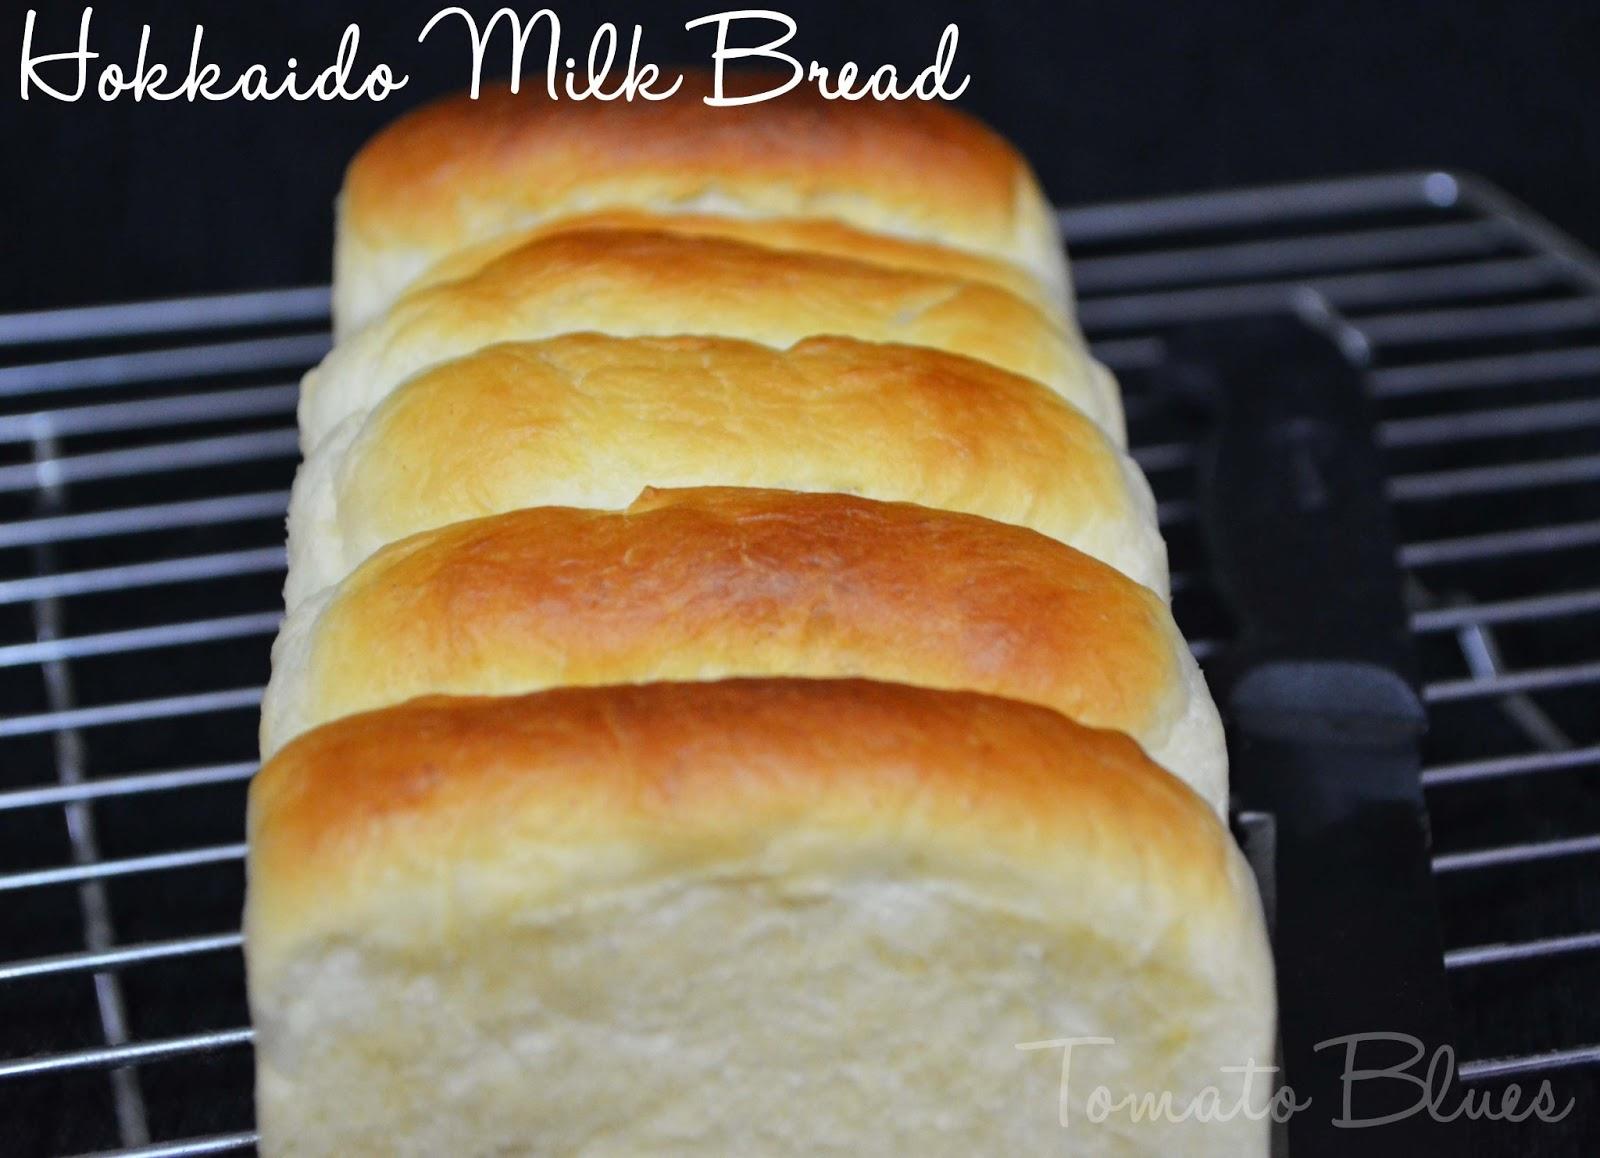 Hokkaido Milk Bread Recipe | Yeast Bread Recipes